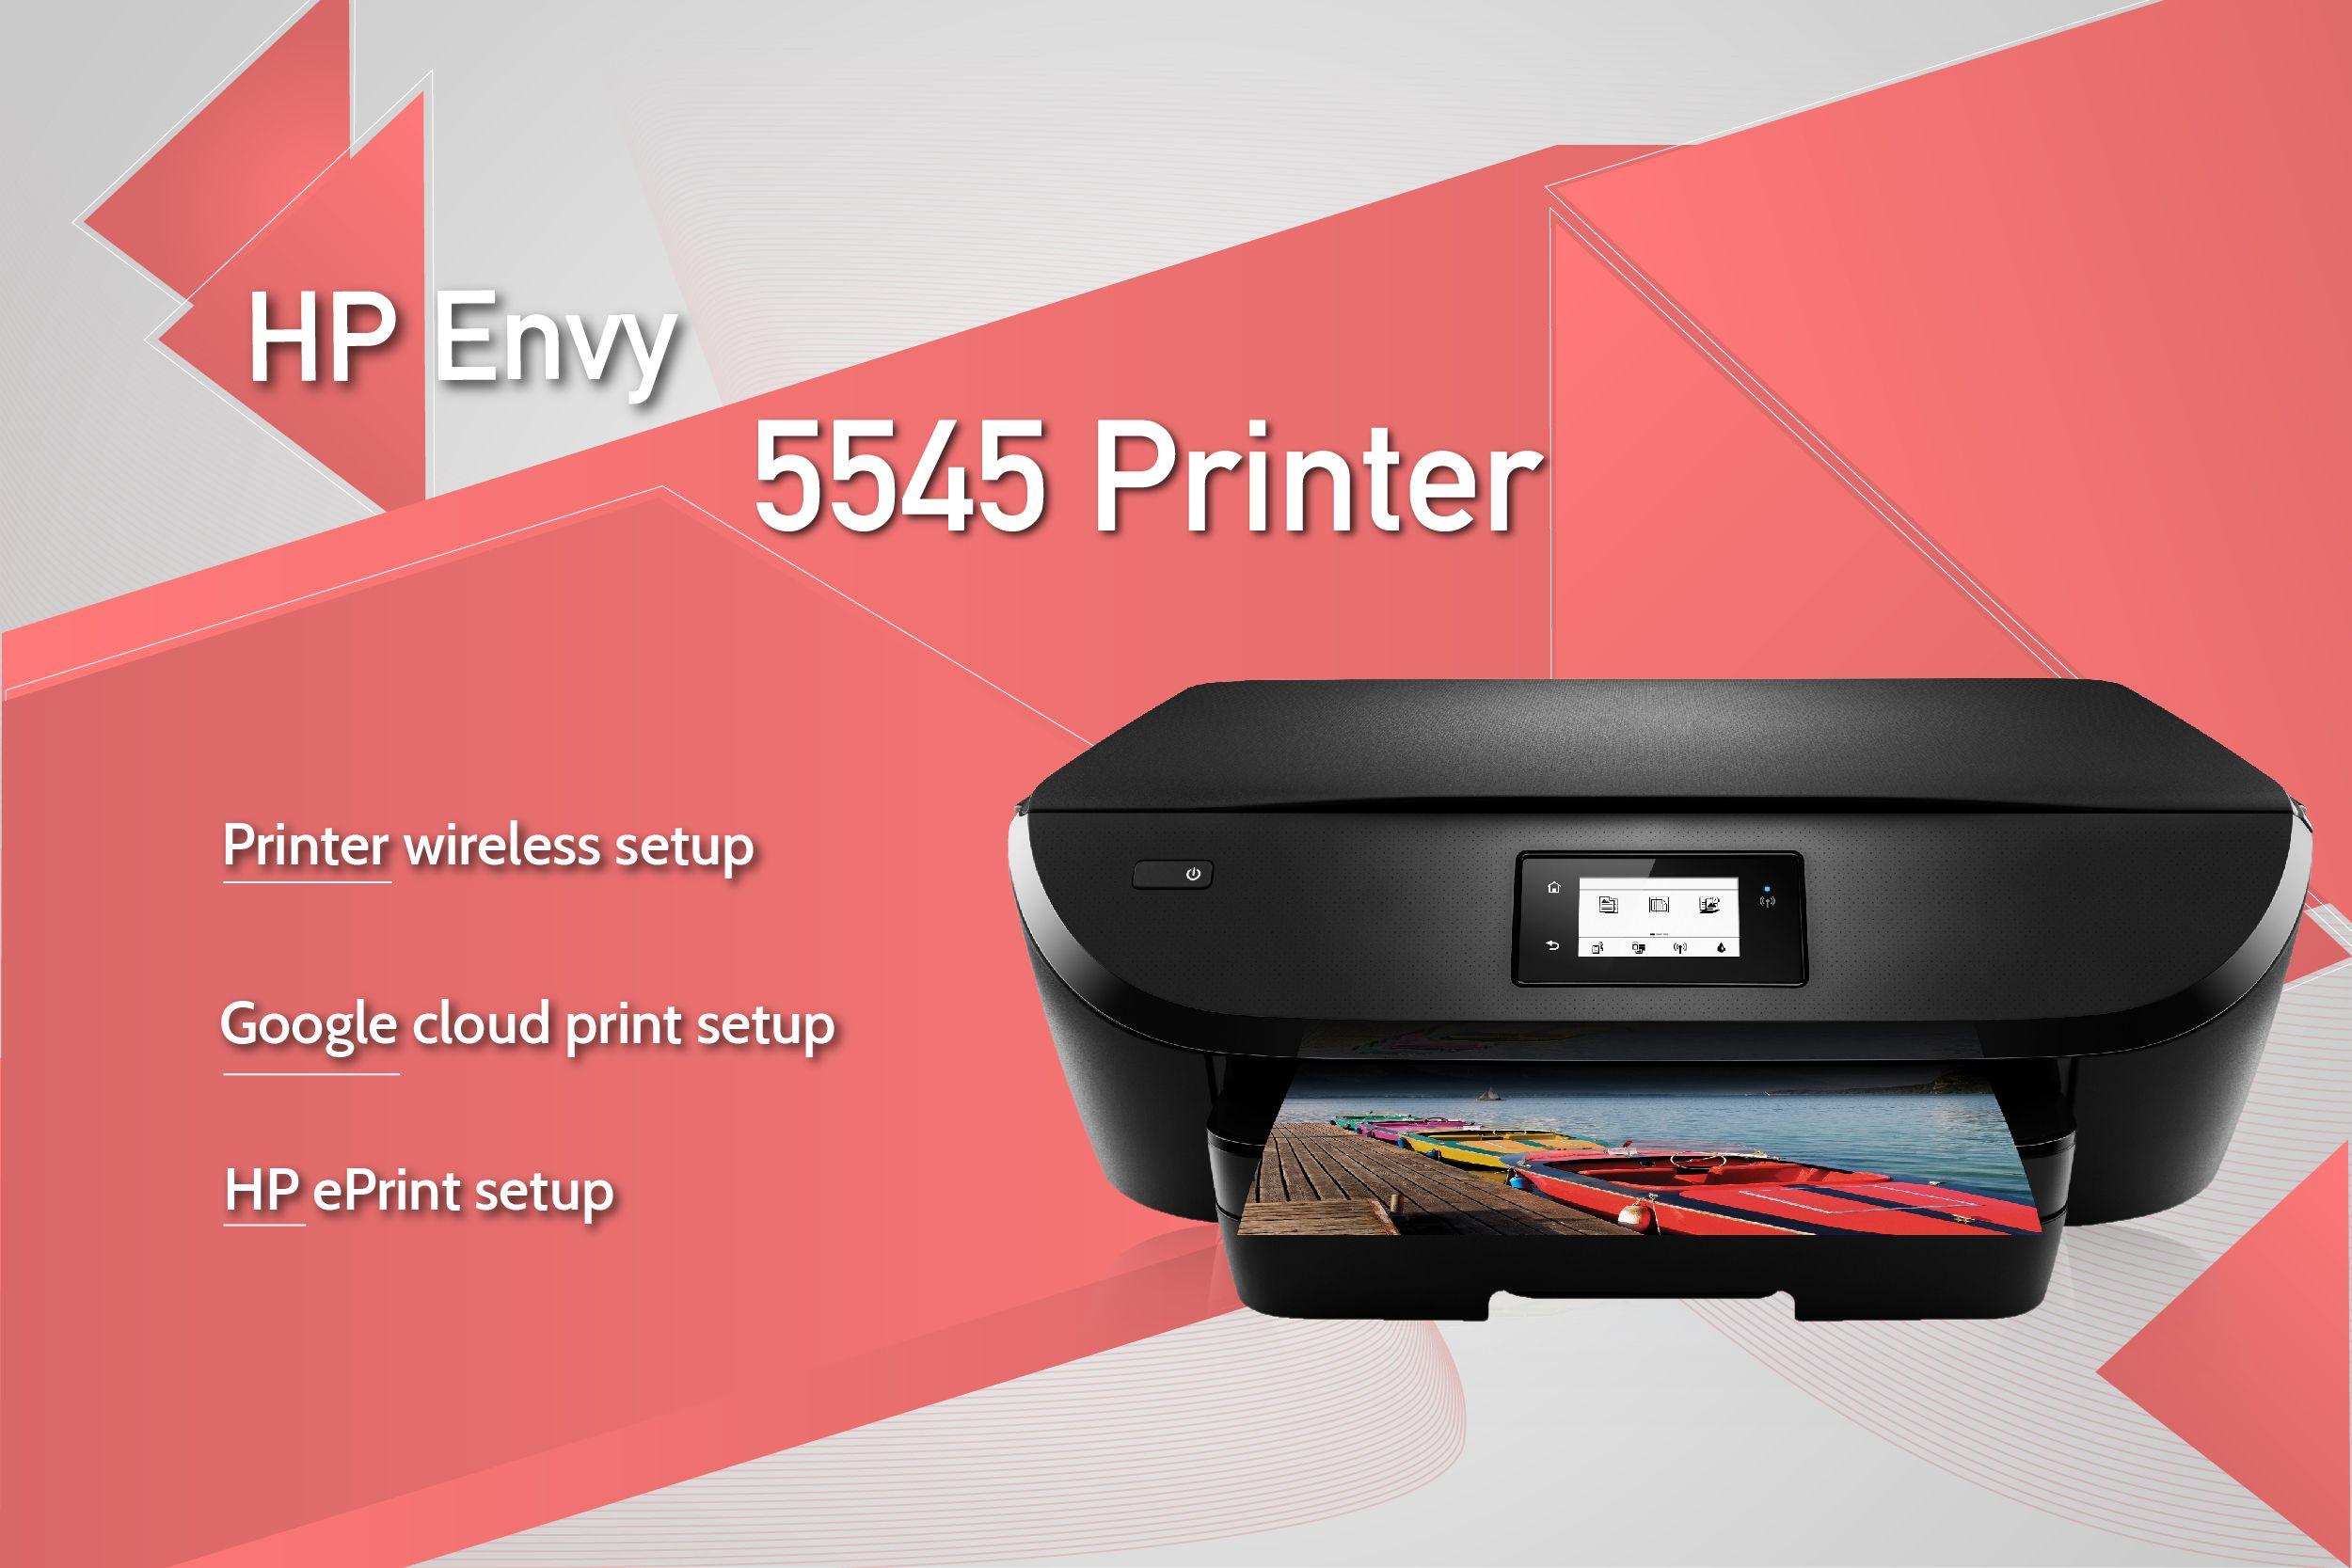 Get solutions for HP Envy 5545 printer wireless setup